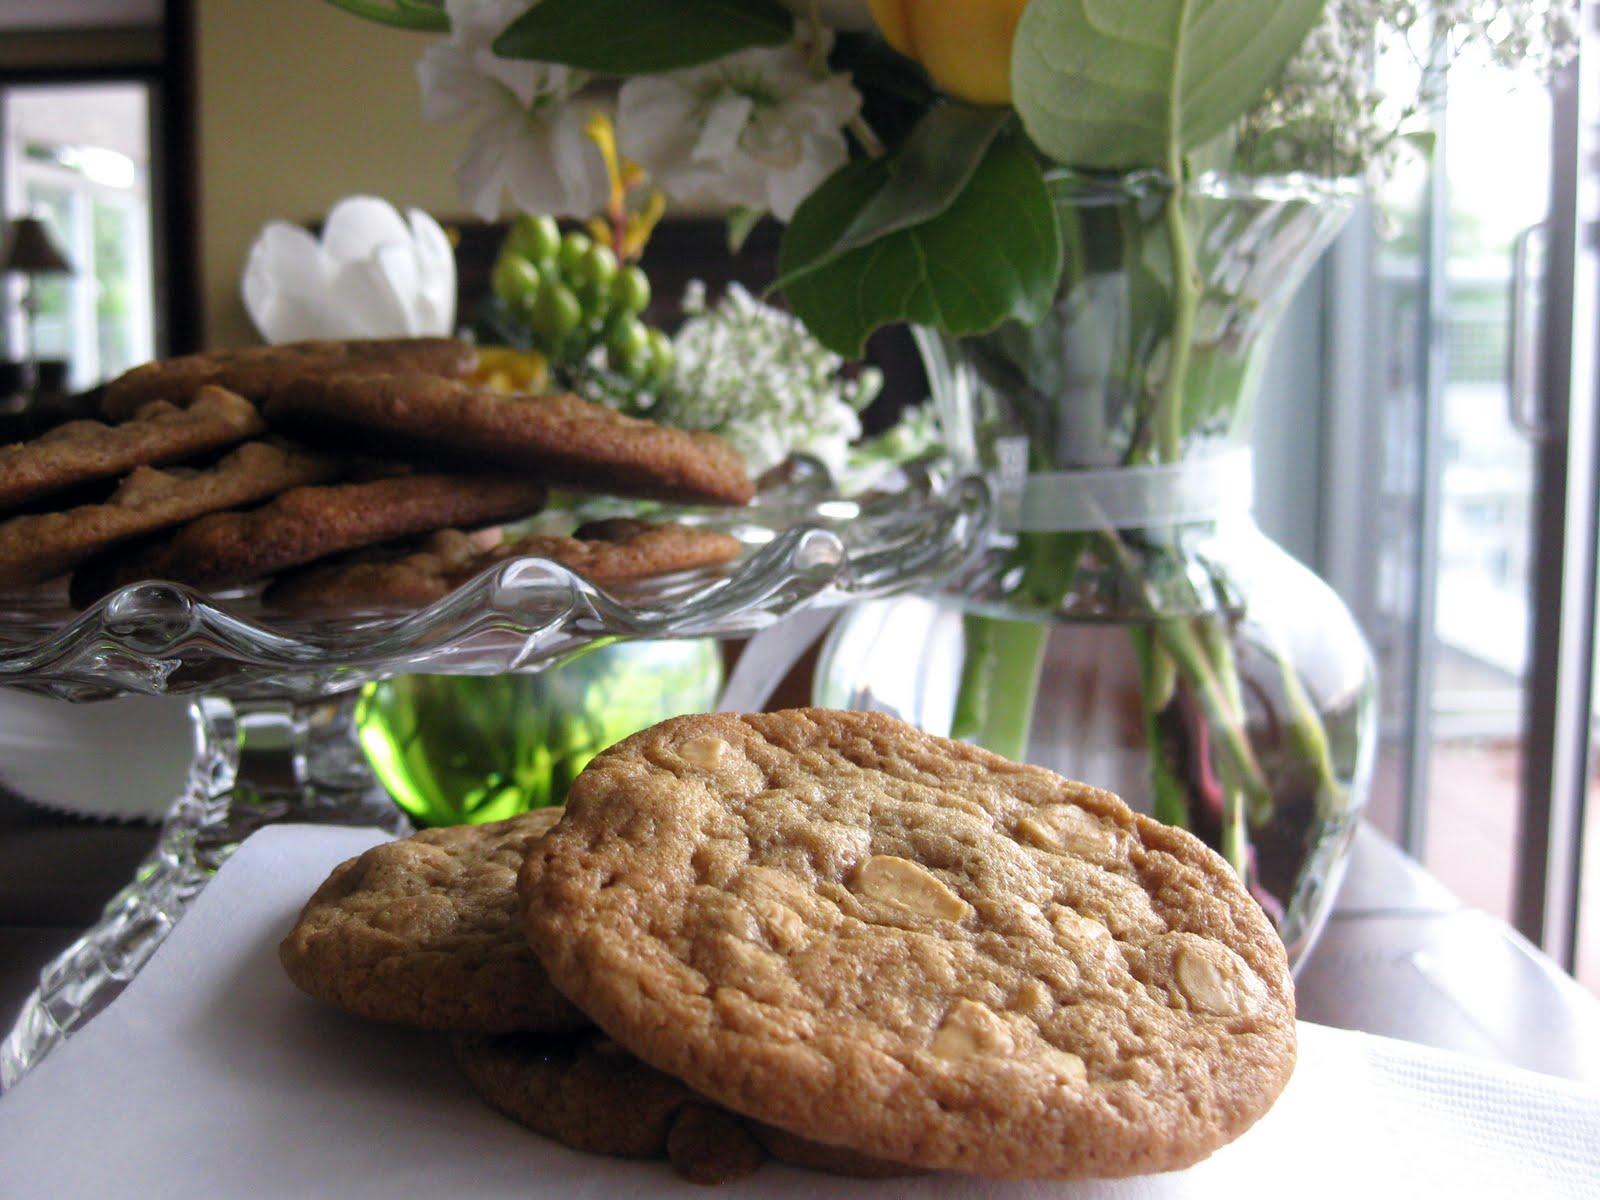 Recipe for butterscotch refrigerator cookies